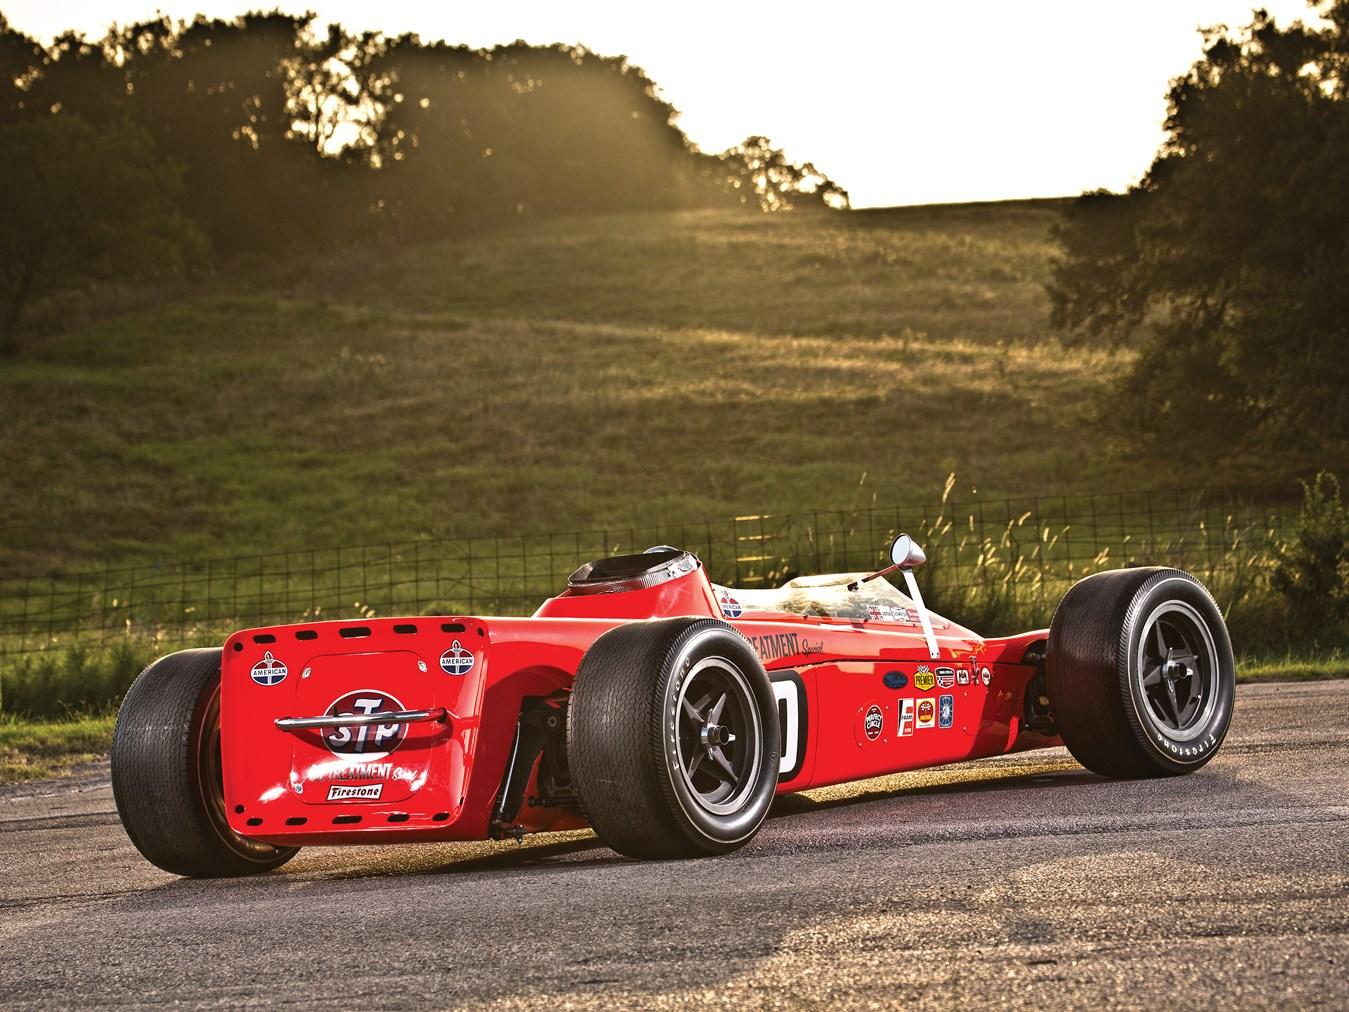 1968 Lotus 56 Indianapolis